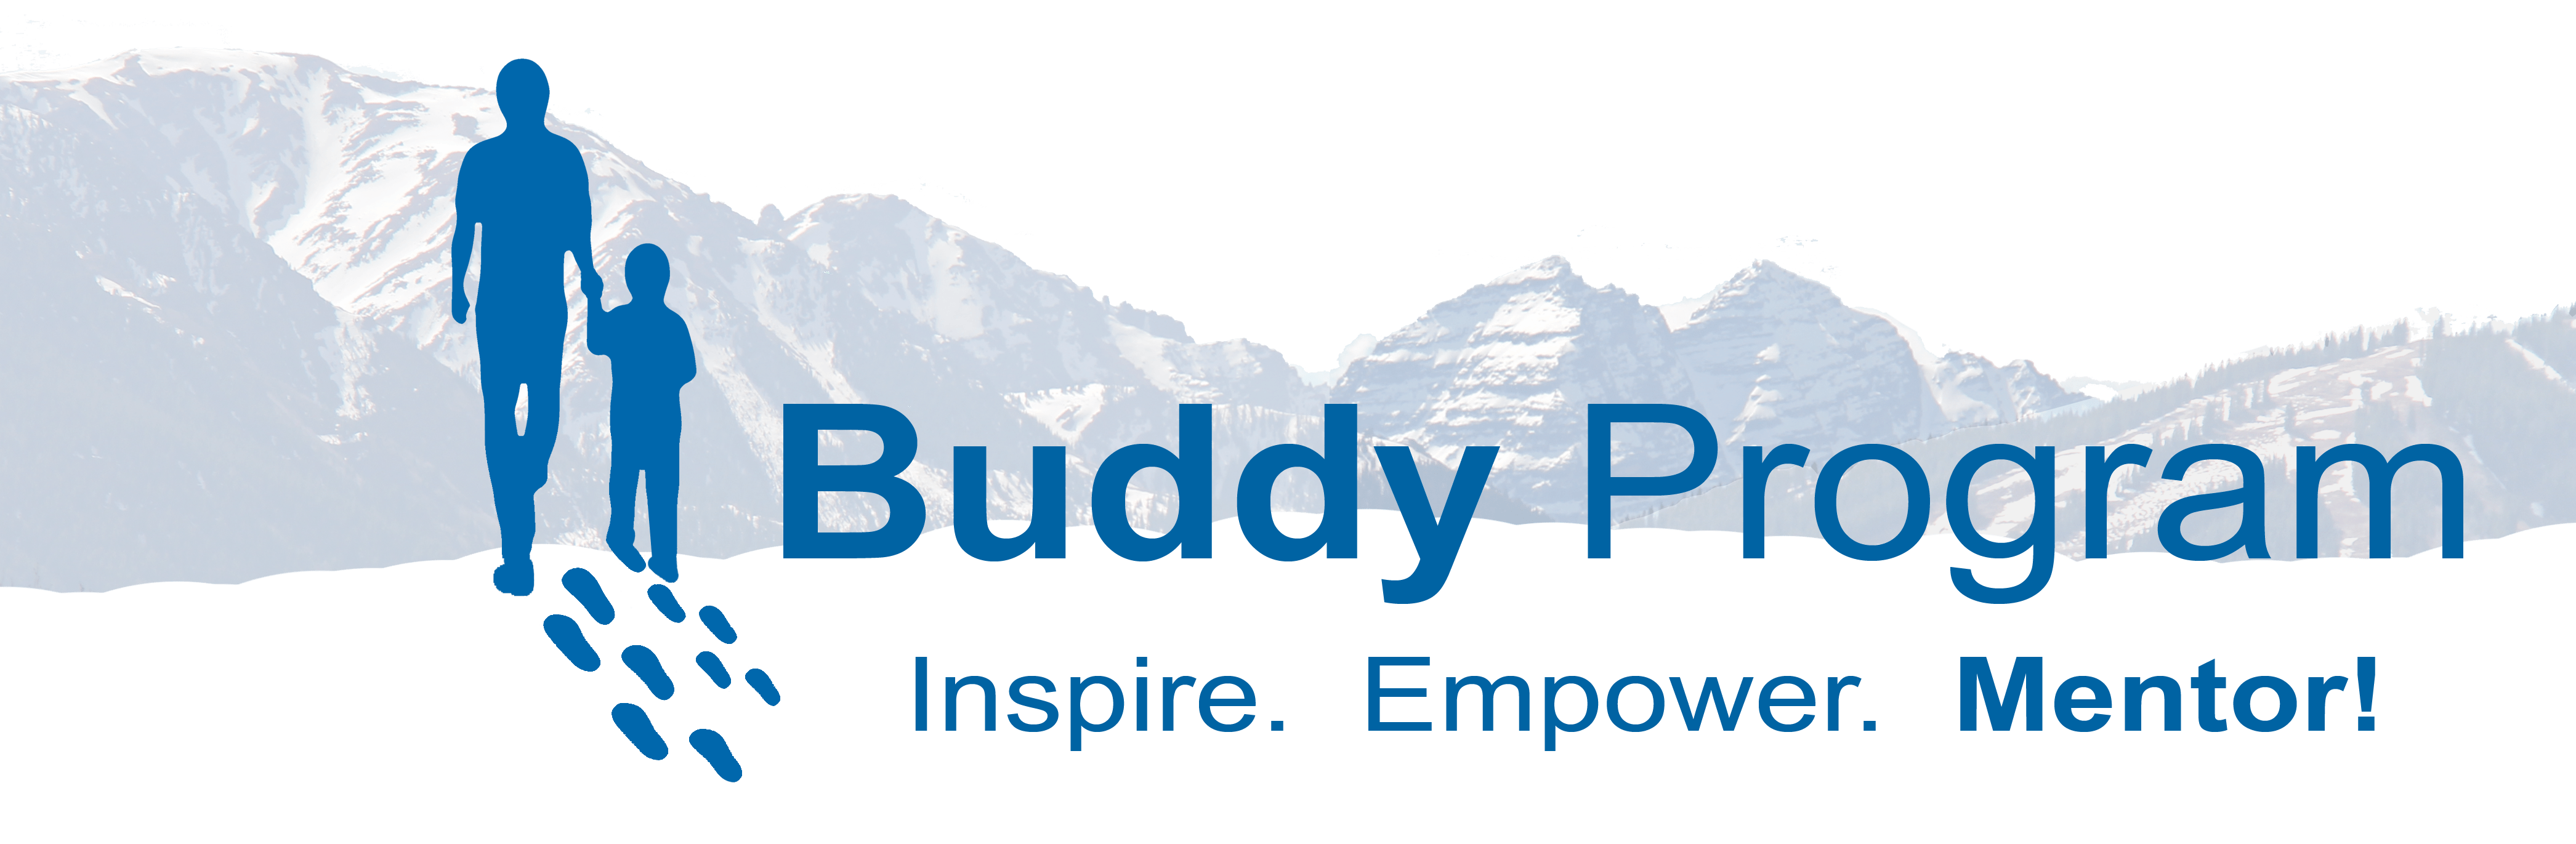 The Buddy Program